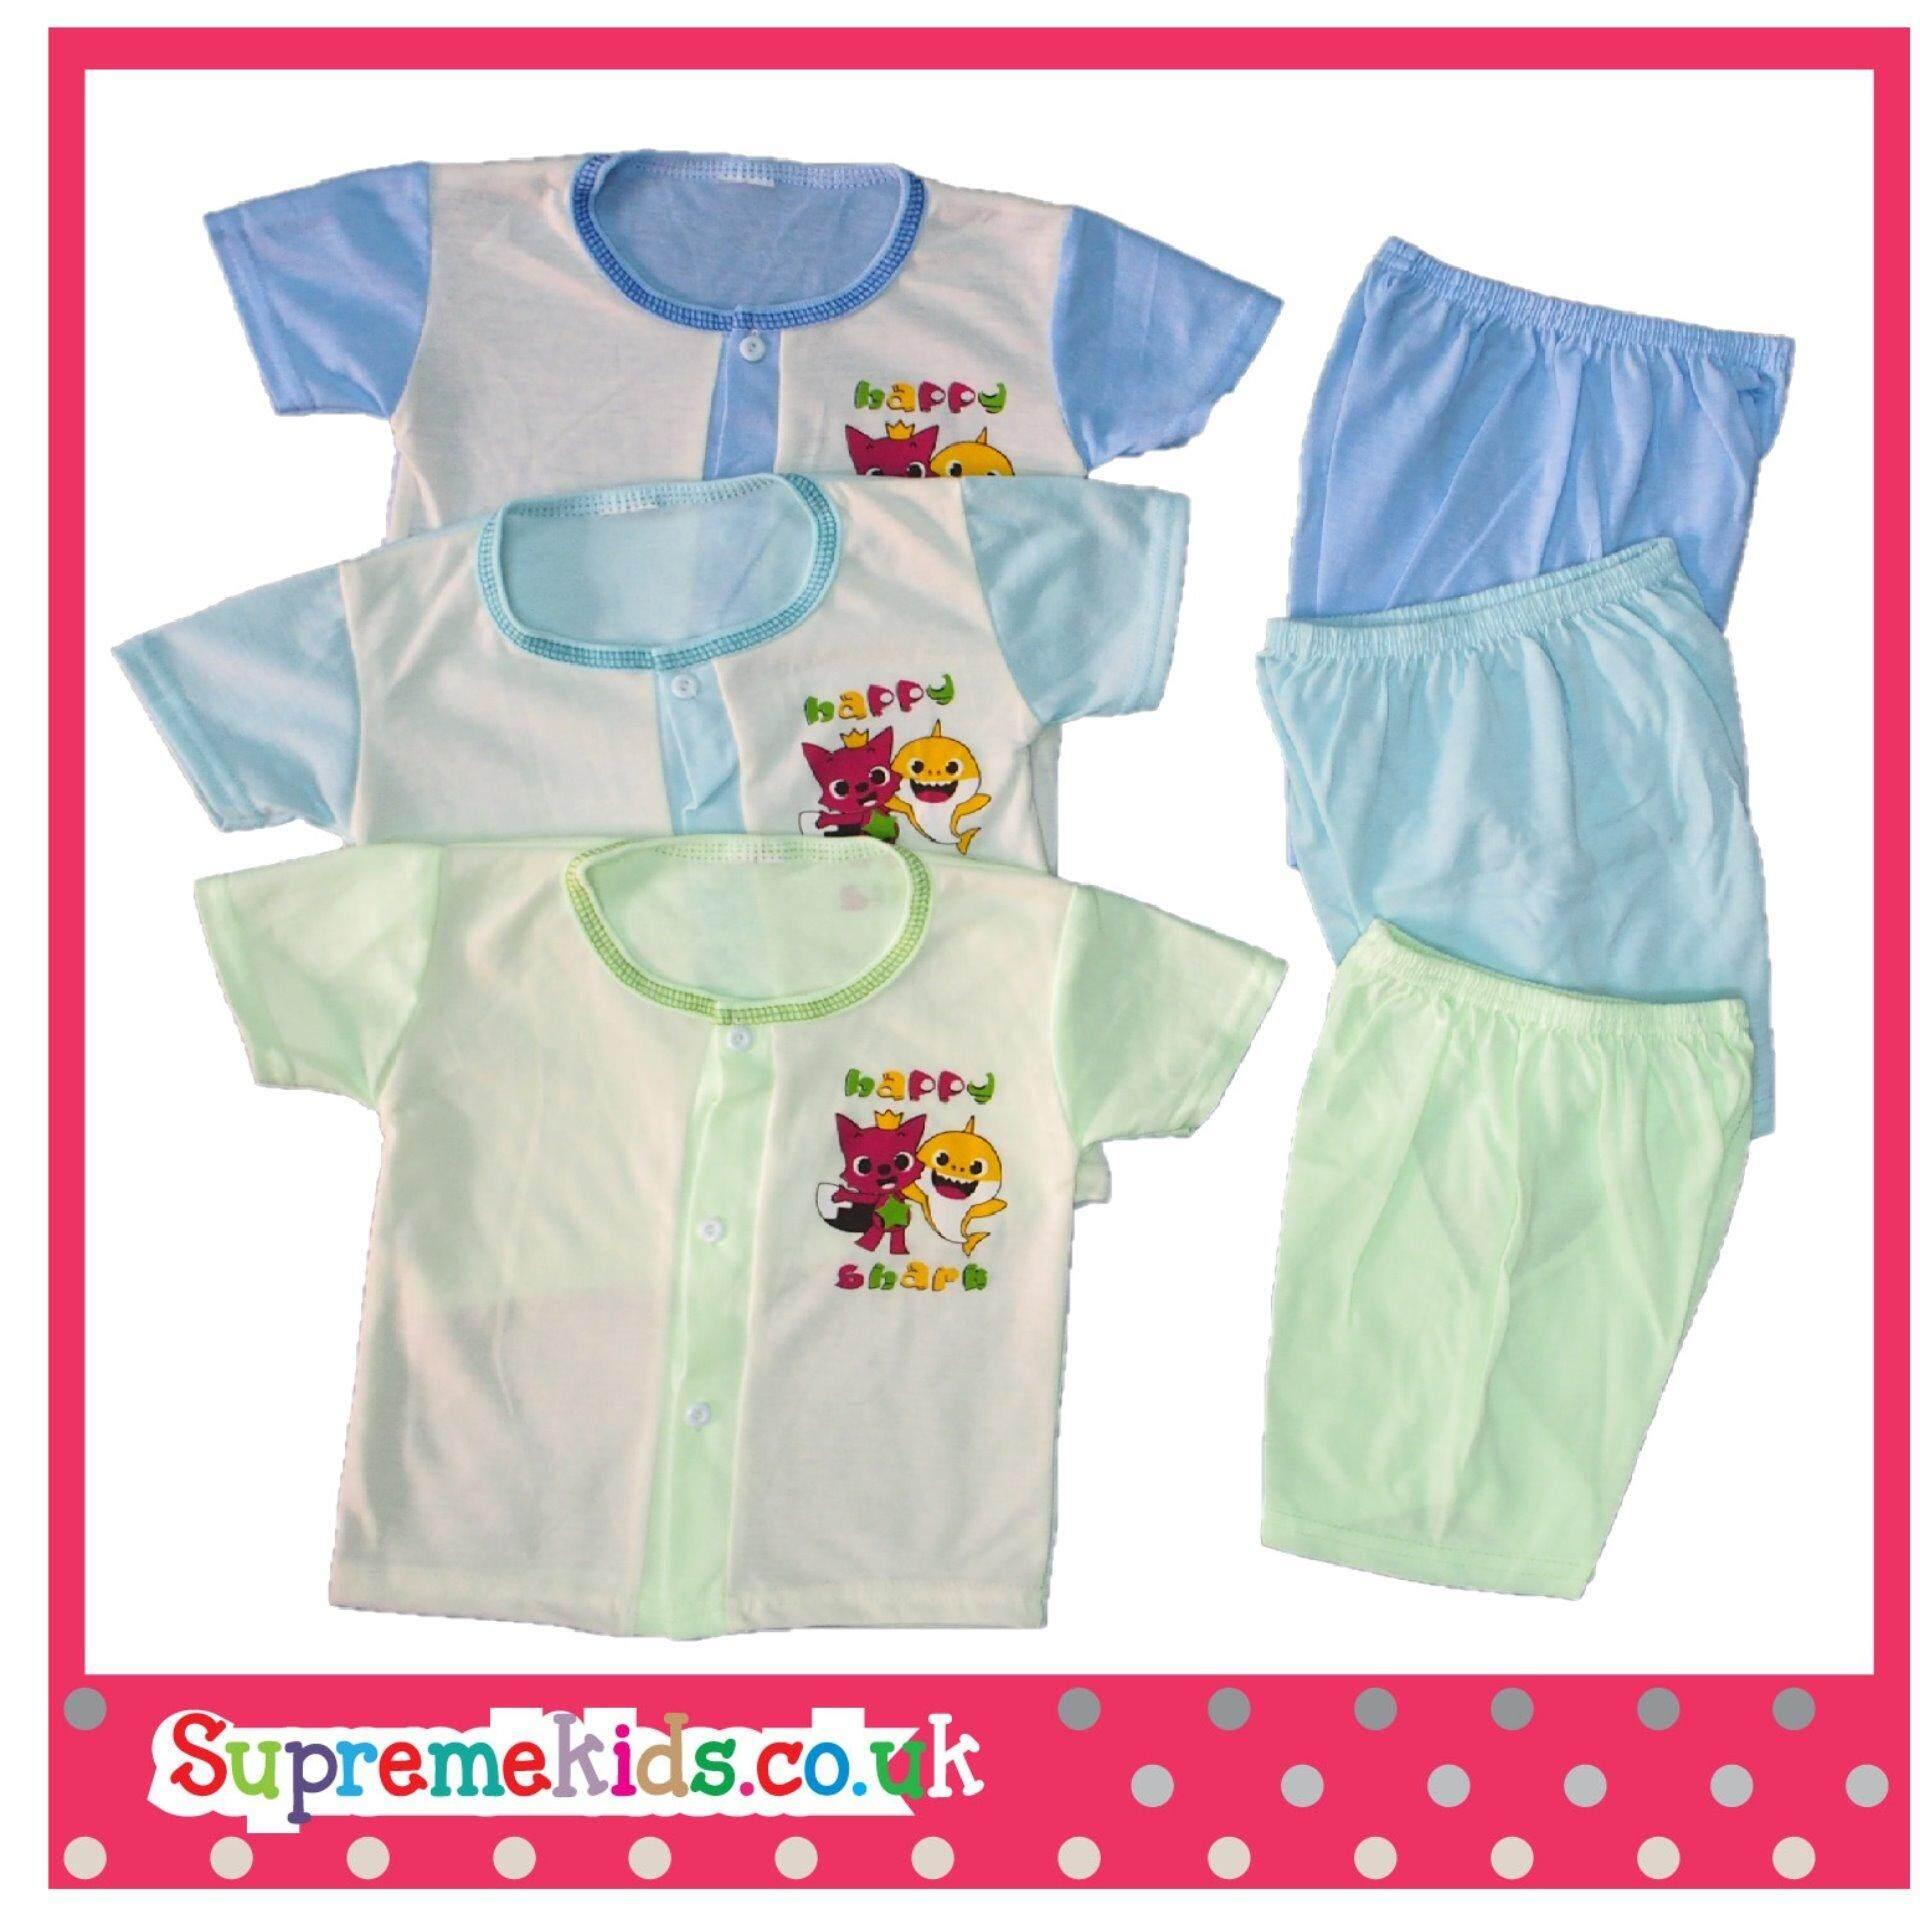 BabyShark & Pink Fong 6Pcs NewBorn Baby Casual wear SSSP